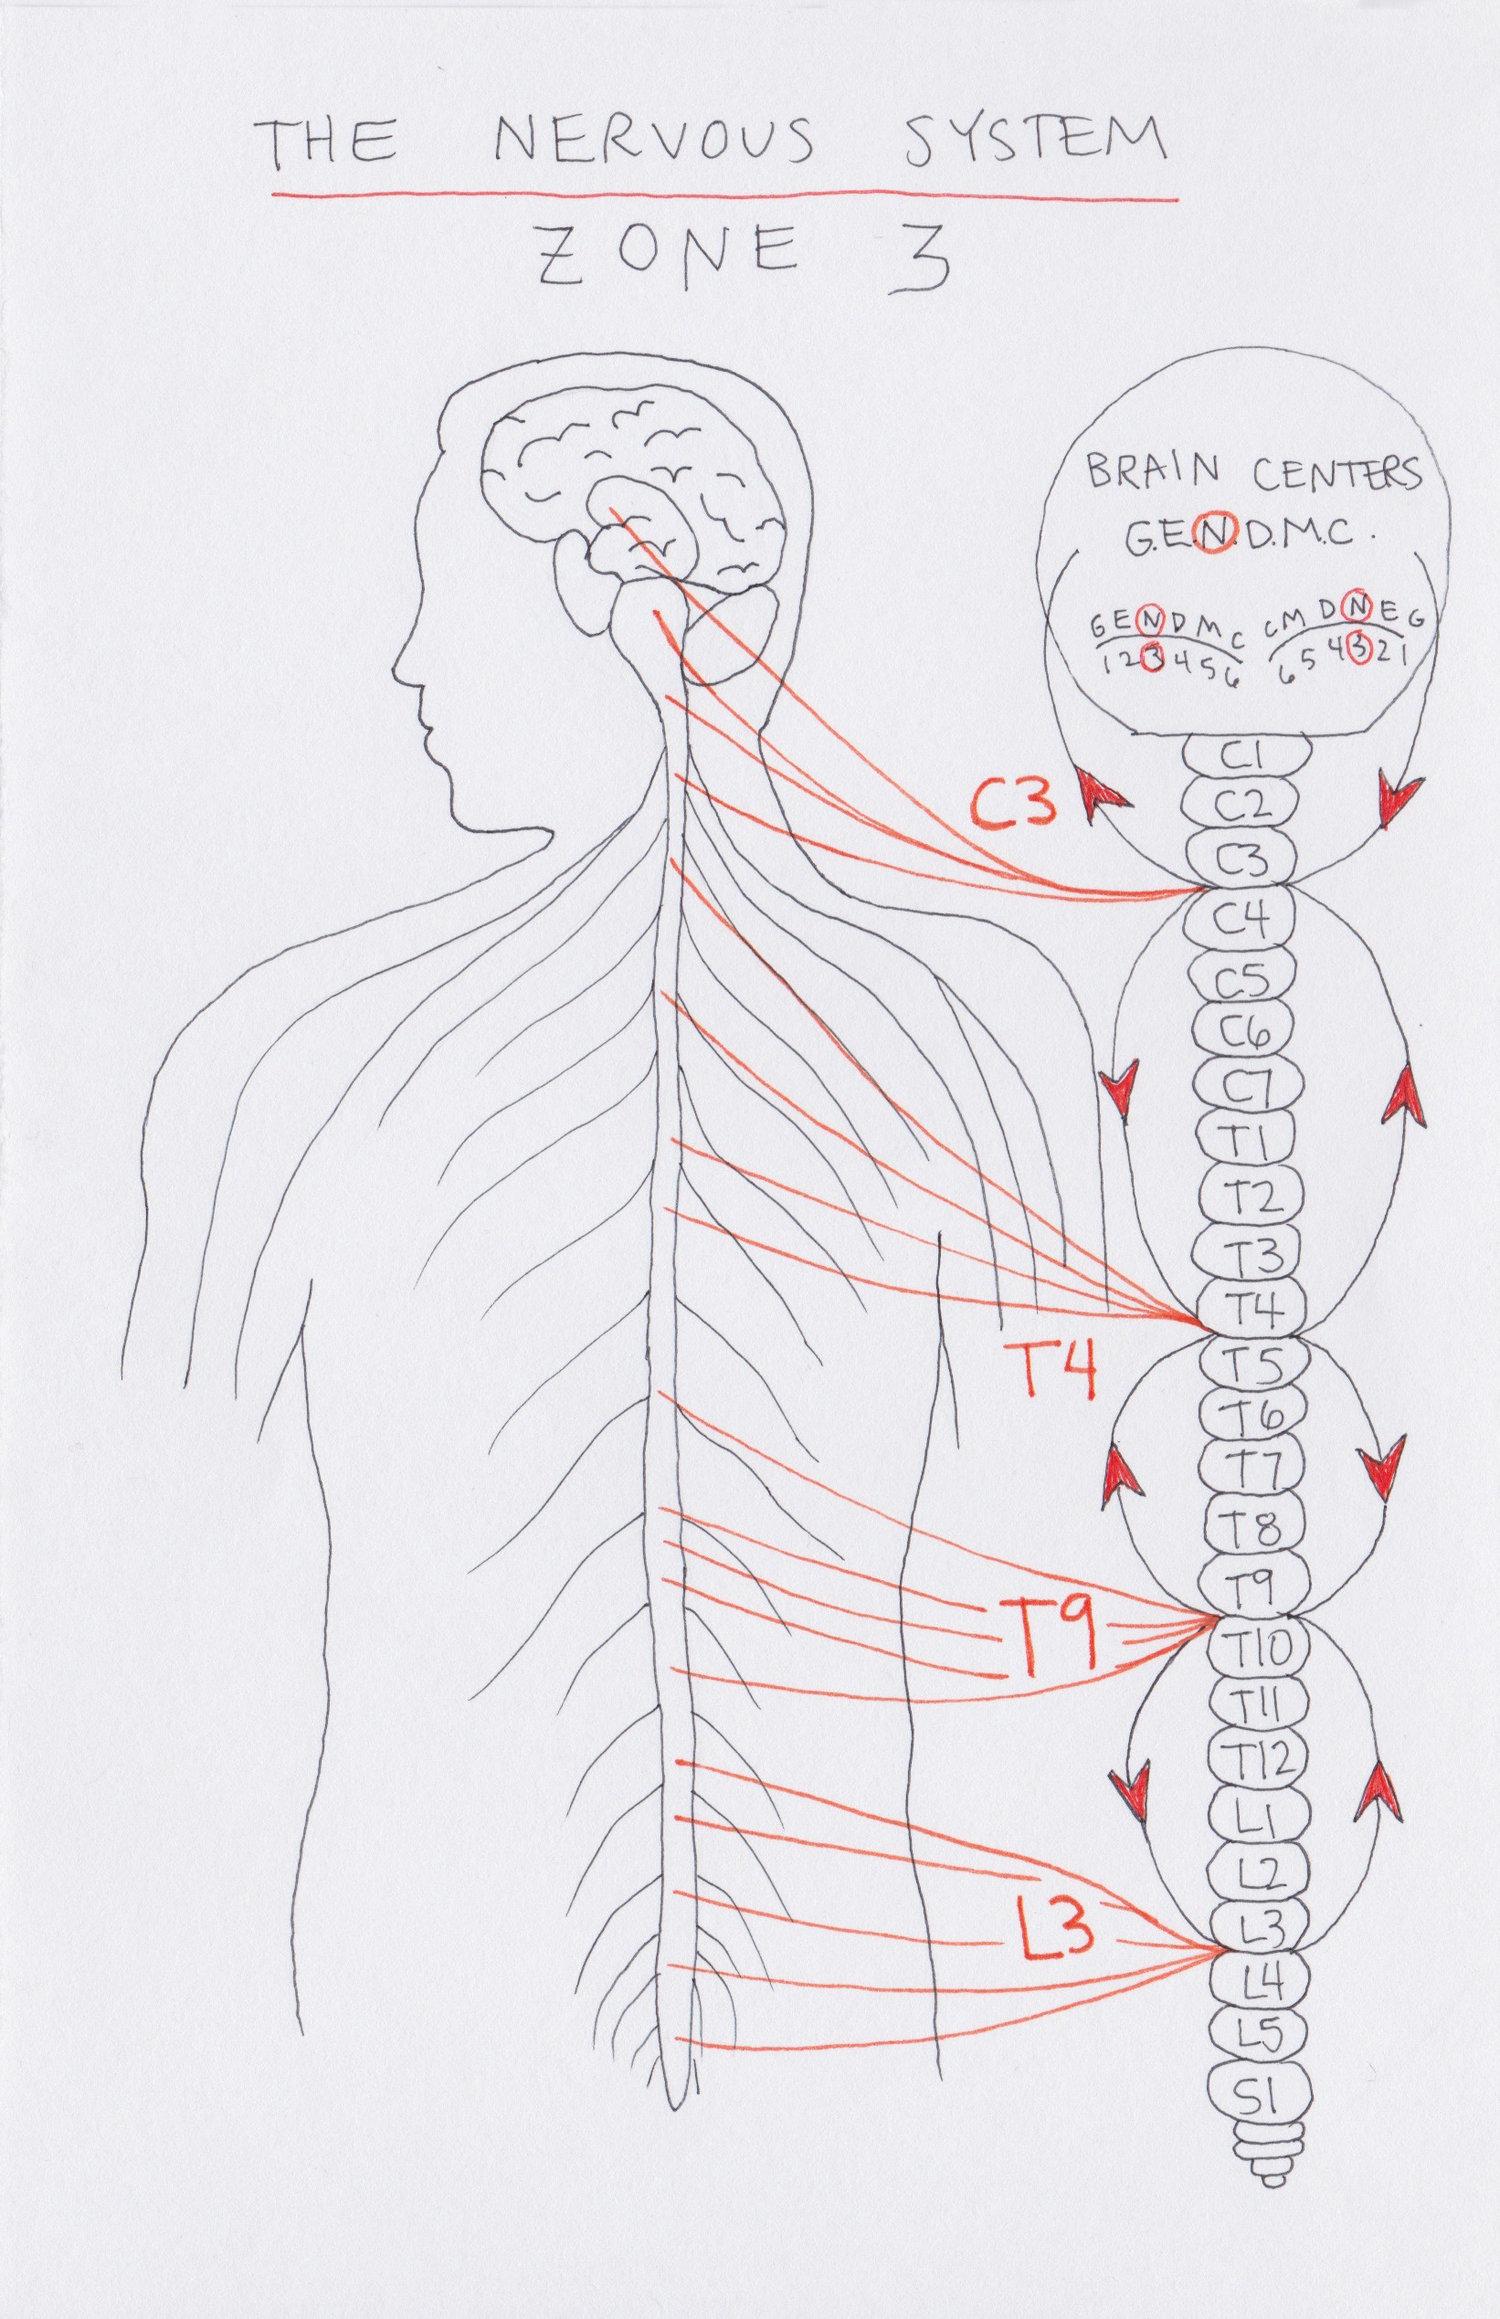 Zone 3 The Nervous Zone Judah St Clinic